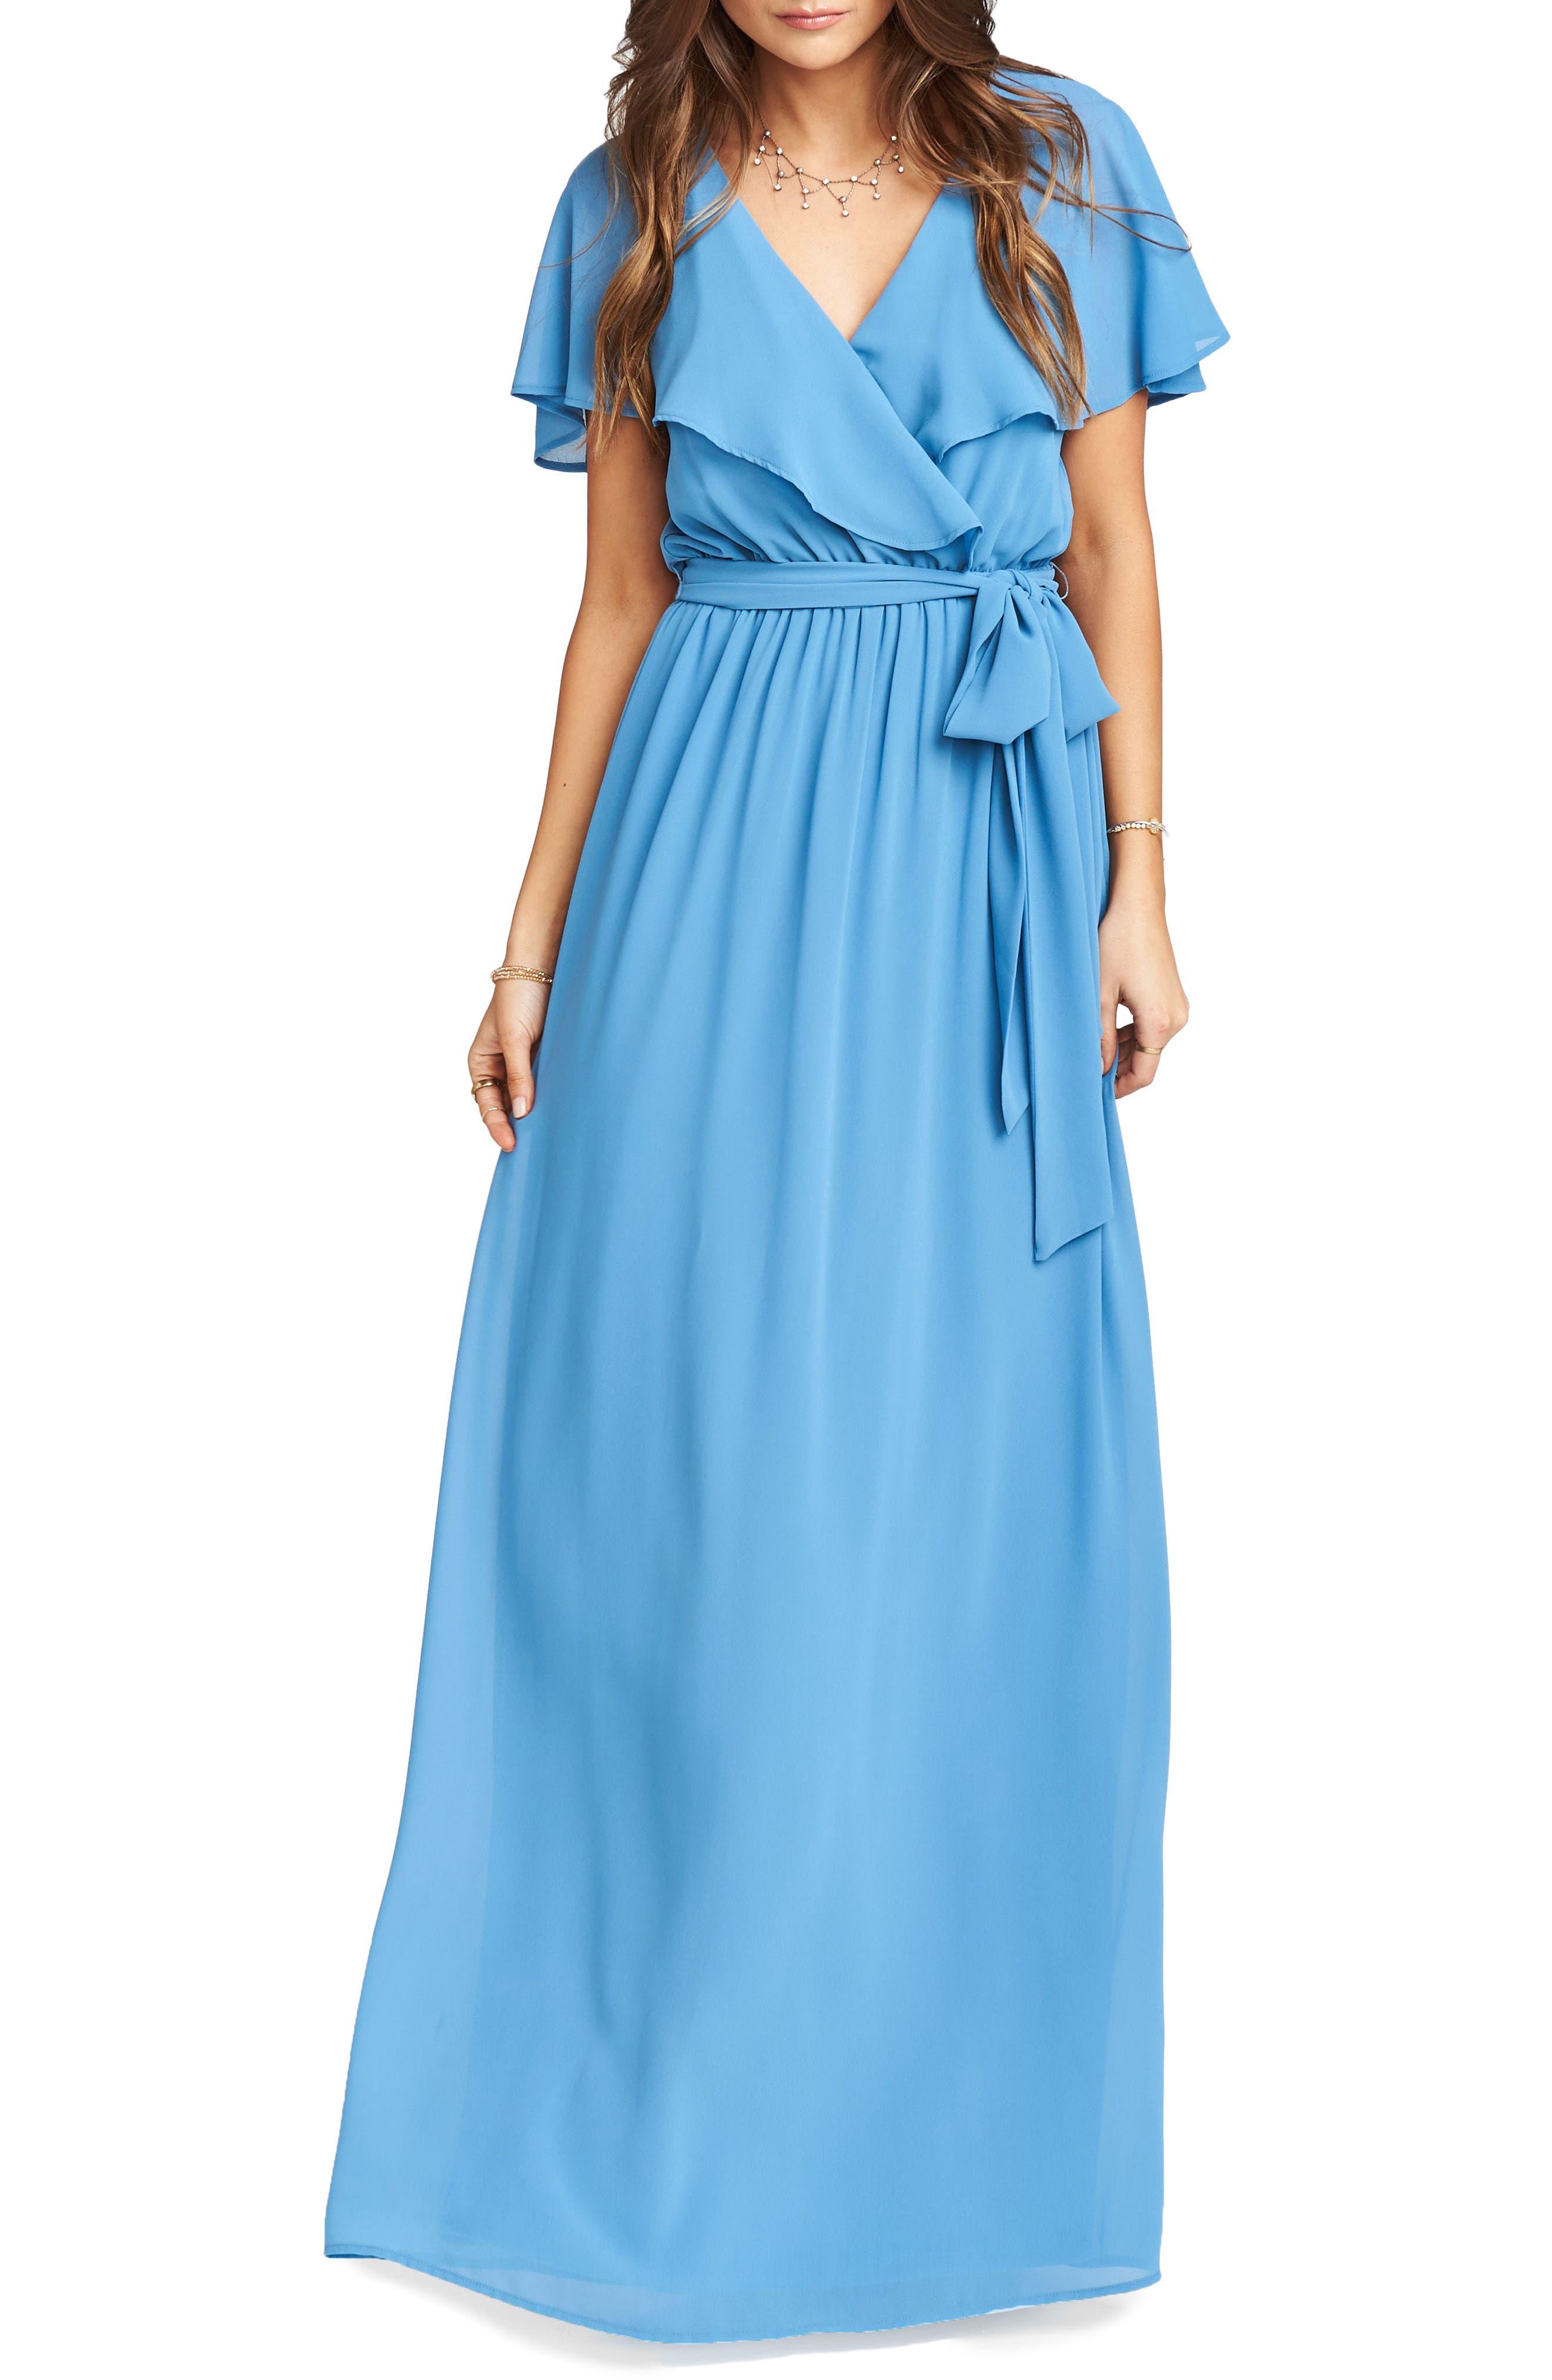 Main Image - Show Me Your Mumu Audrey Ruffle Wrap Front Gown